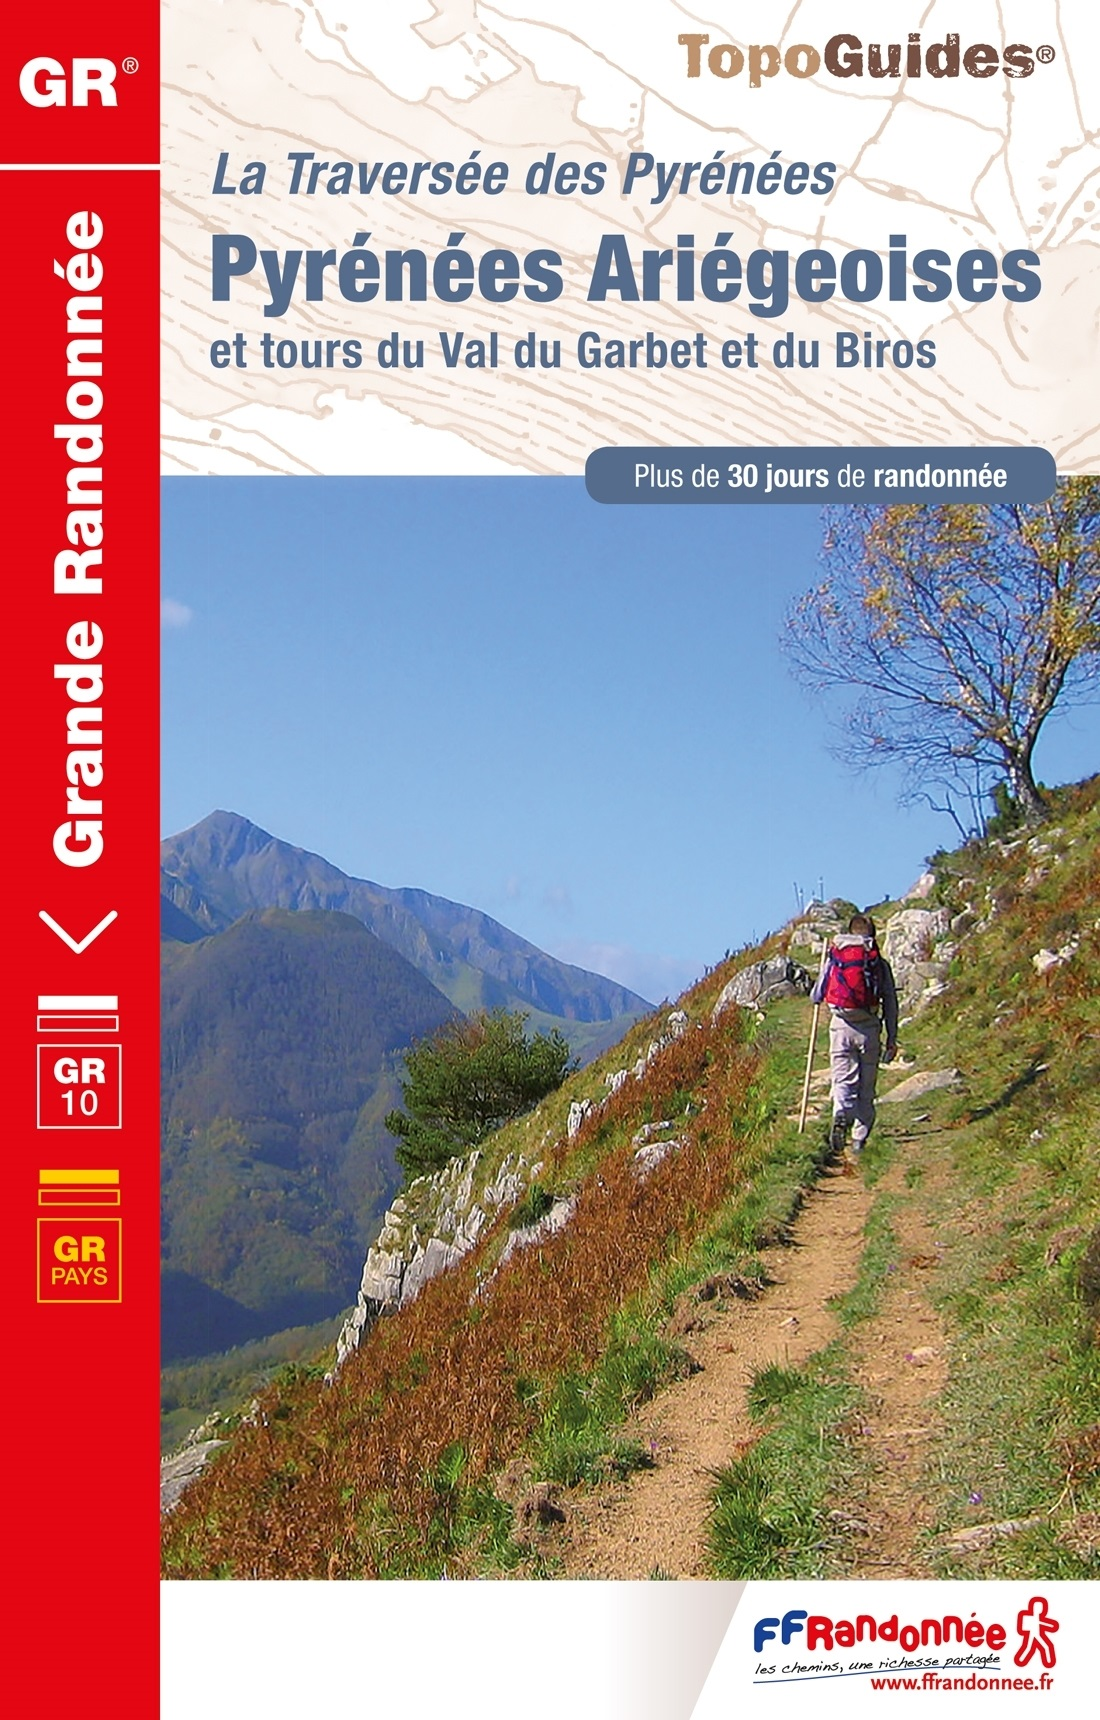 TG-1090  Traversée des Pyrénées Ariégeoises | wandelgids GR-10 9782751409851  FFRP Topoguides  Meerdaagse wandelroutes, Wandelgidsen Franse Pyreneeën